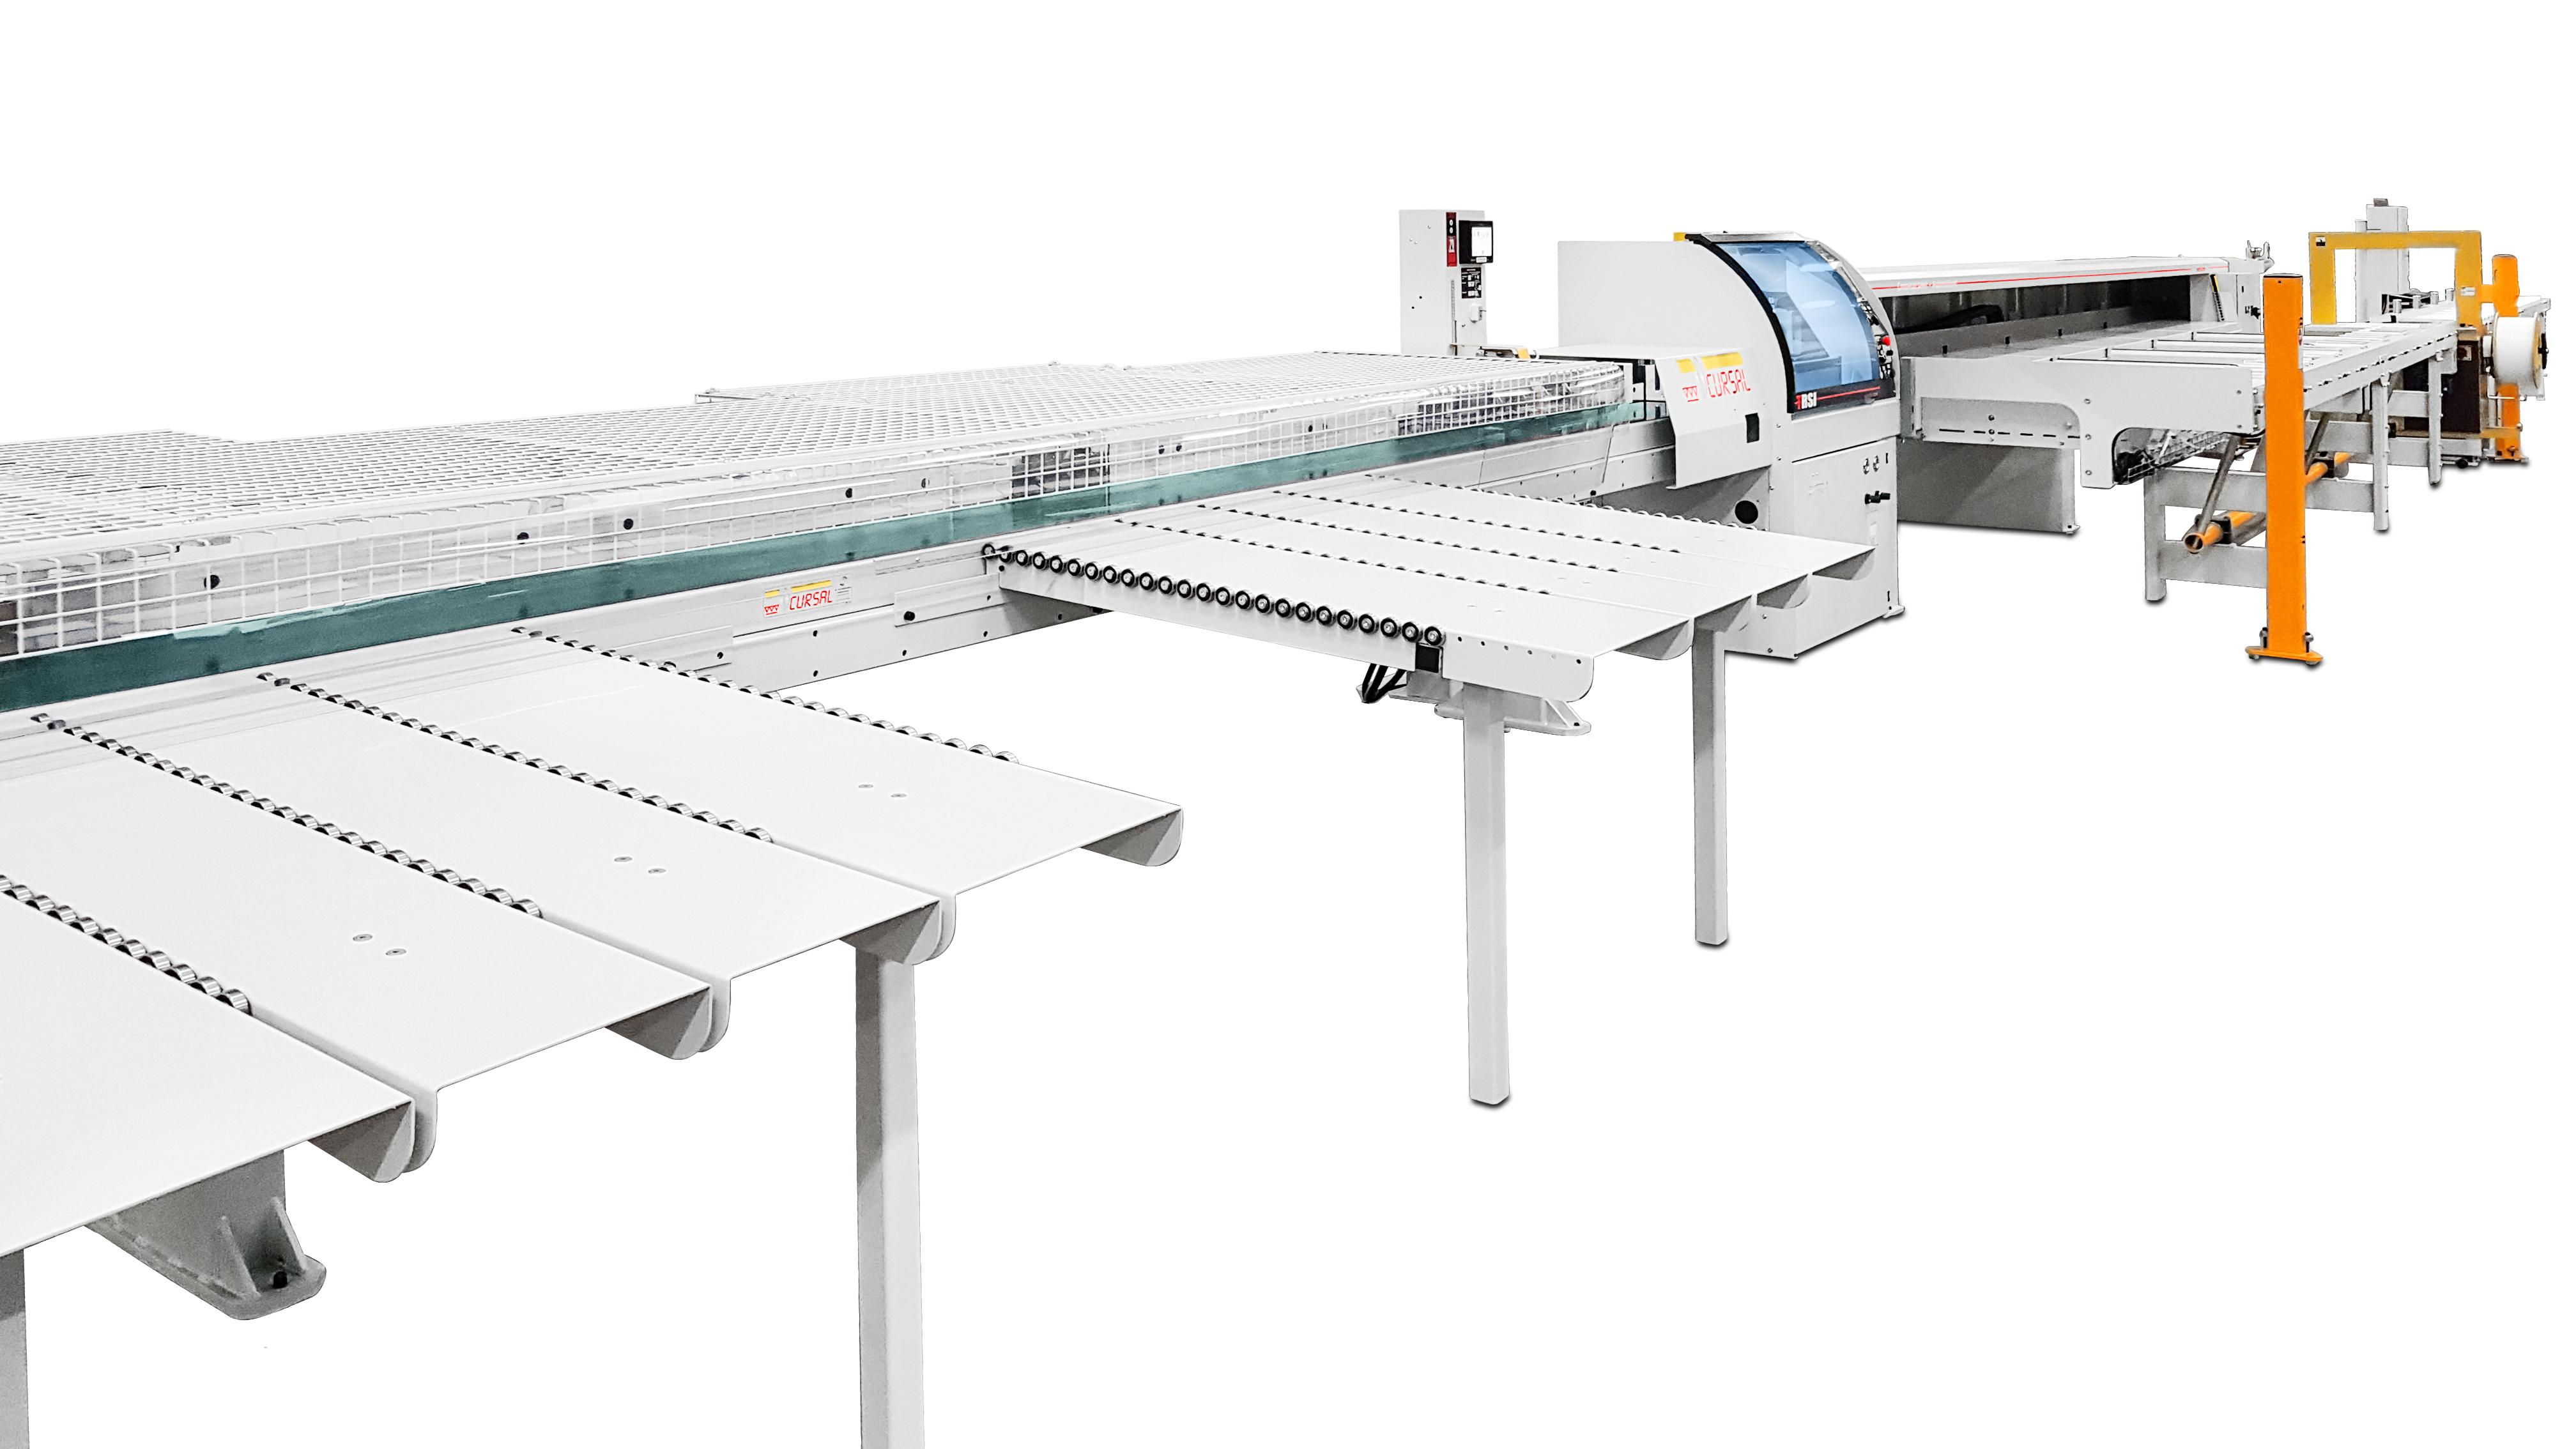 cursal-optimizing-push-feed-saws-trsi-500-25